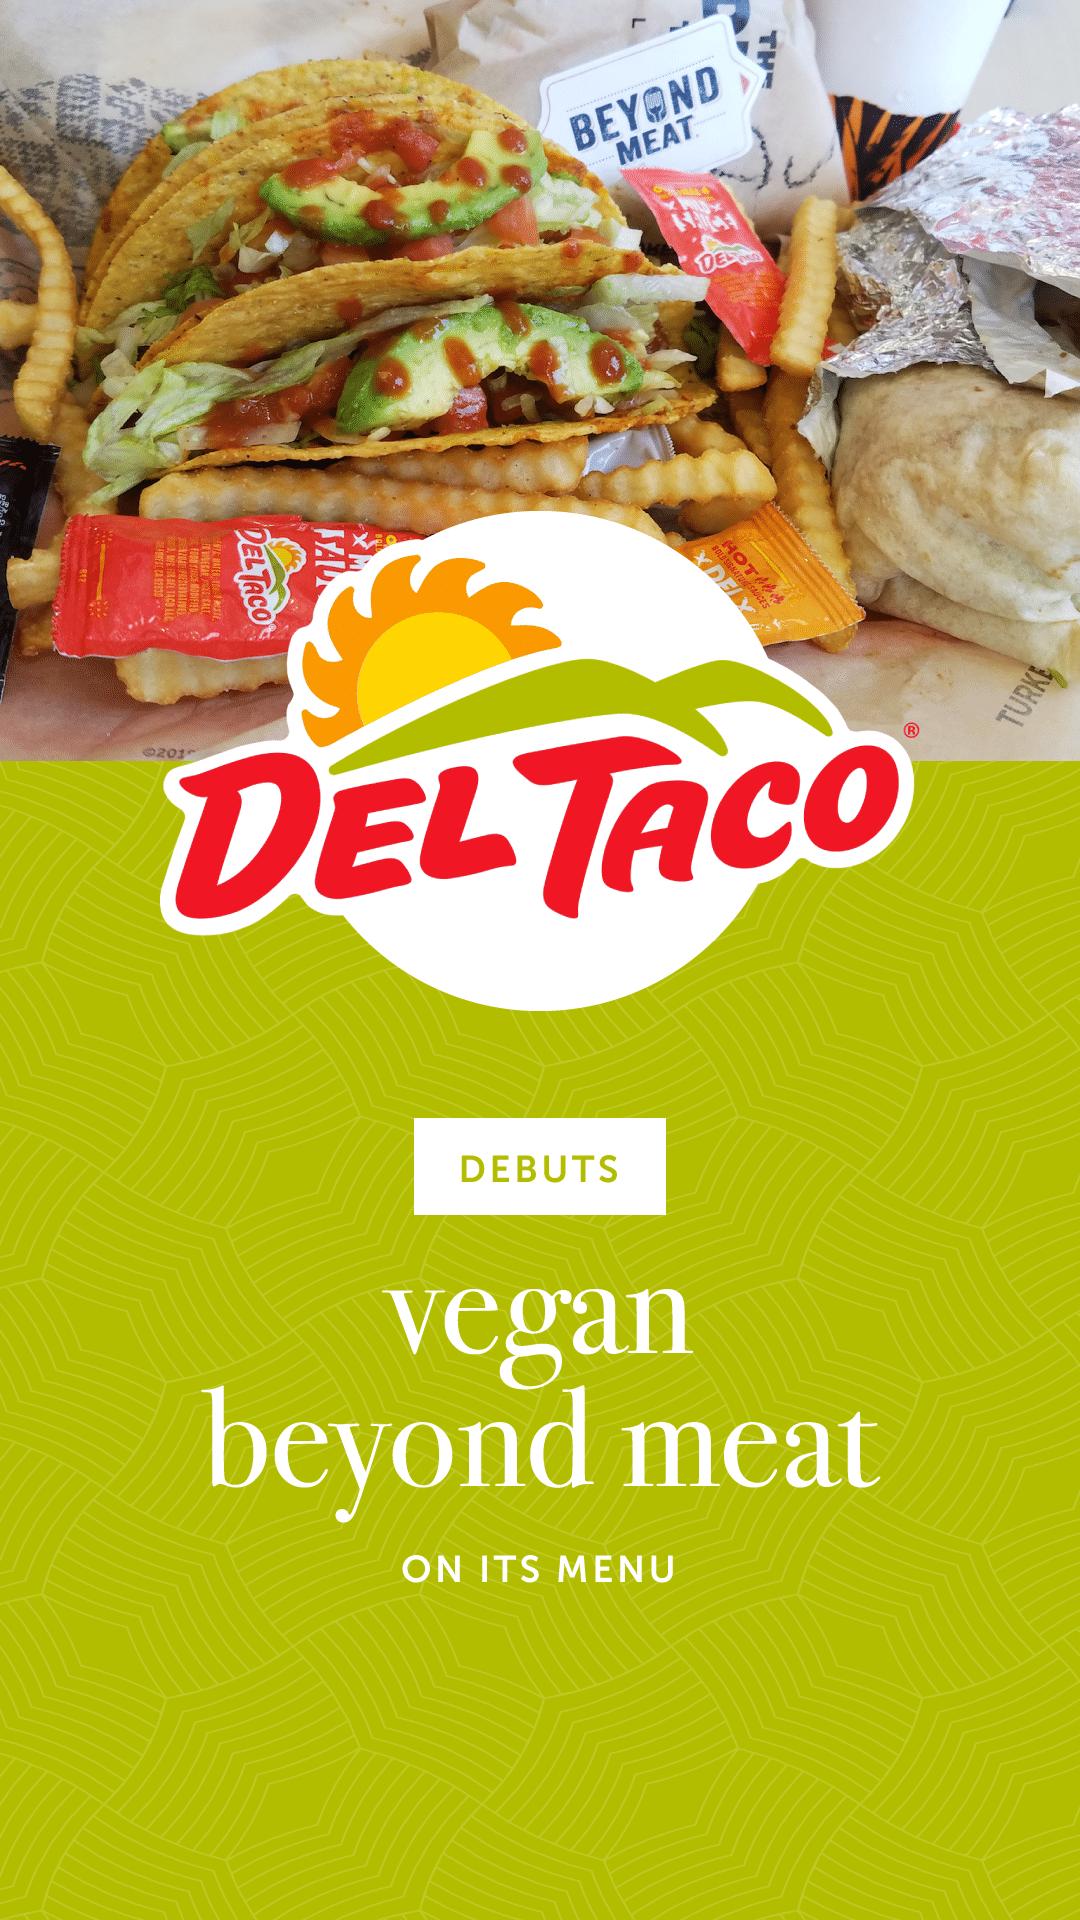 Del Taco Debuts Vegan Beyond Meat on Its Menu